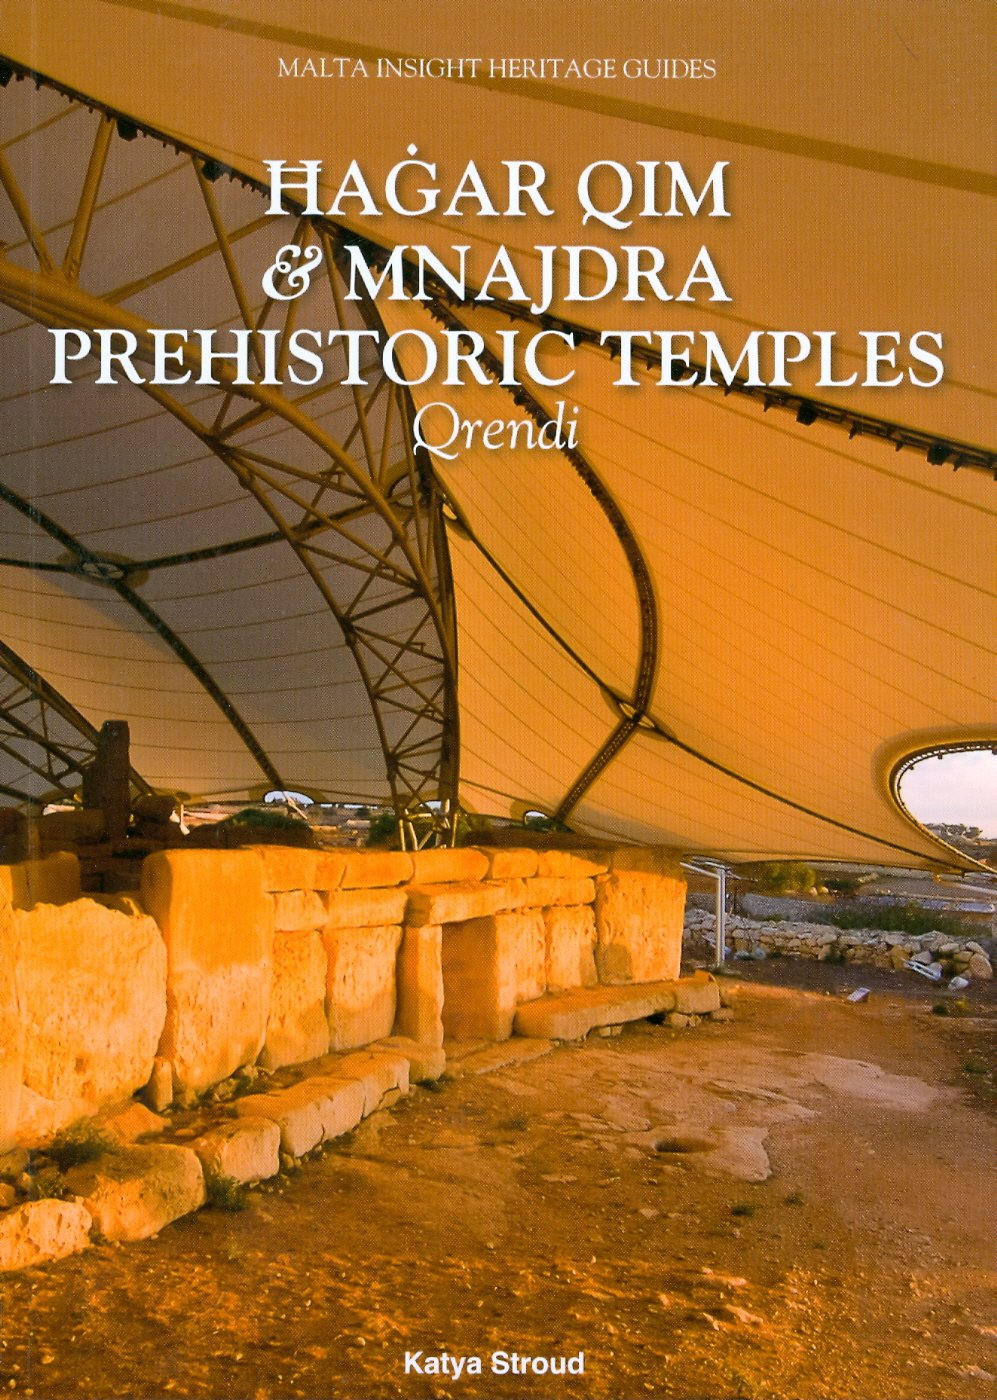 Hagar Qim and Mnajdra: Prehistoric Temples, Qrendi (Insight Heritage Guides) Paperback – December 31, 2010 Katya Stroud Ktaya Stroud Midsea Books 9993273171